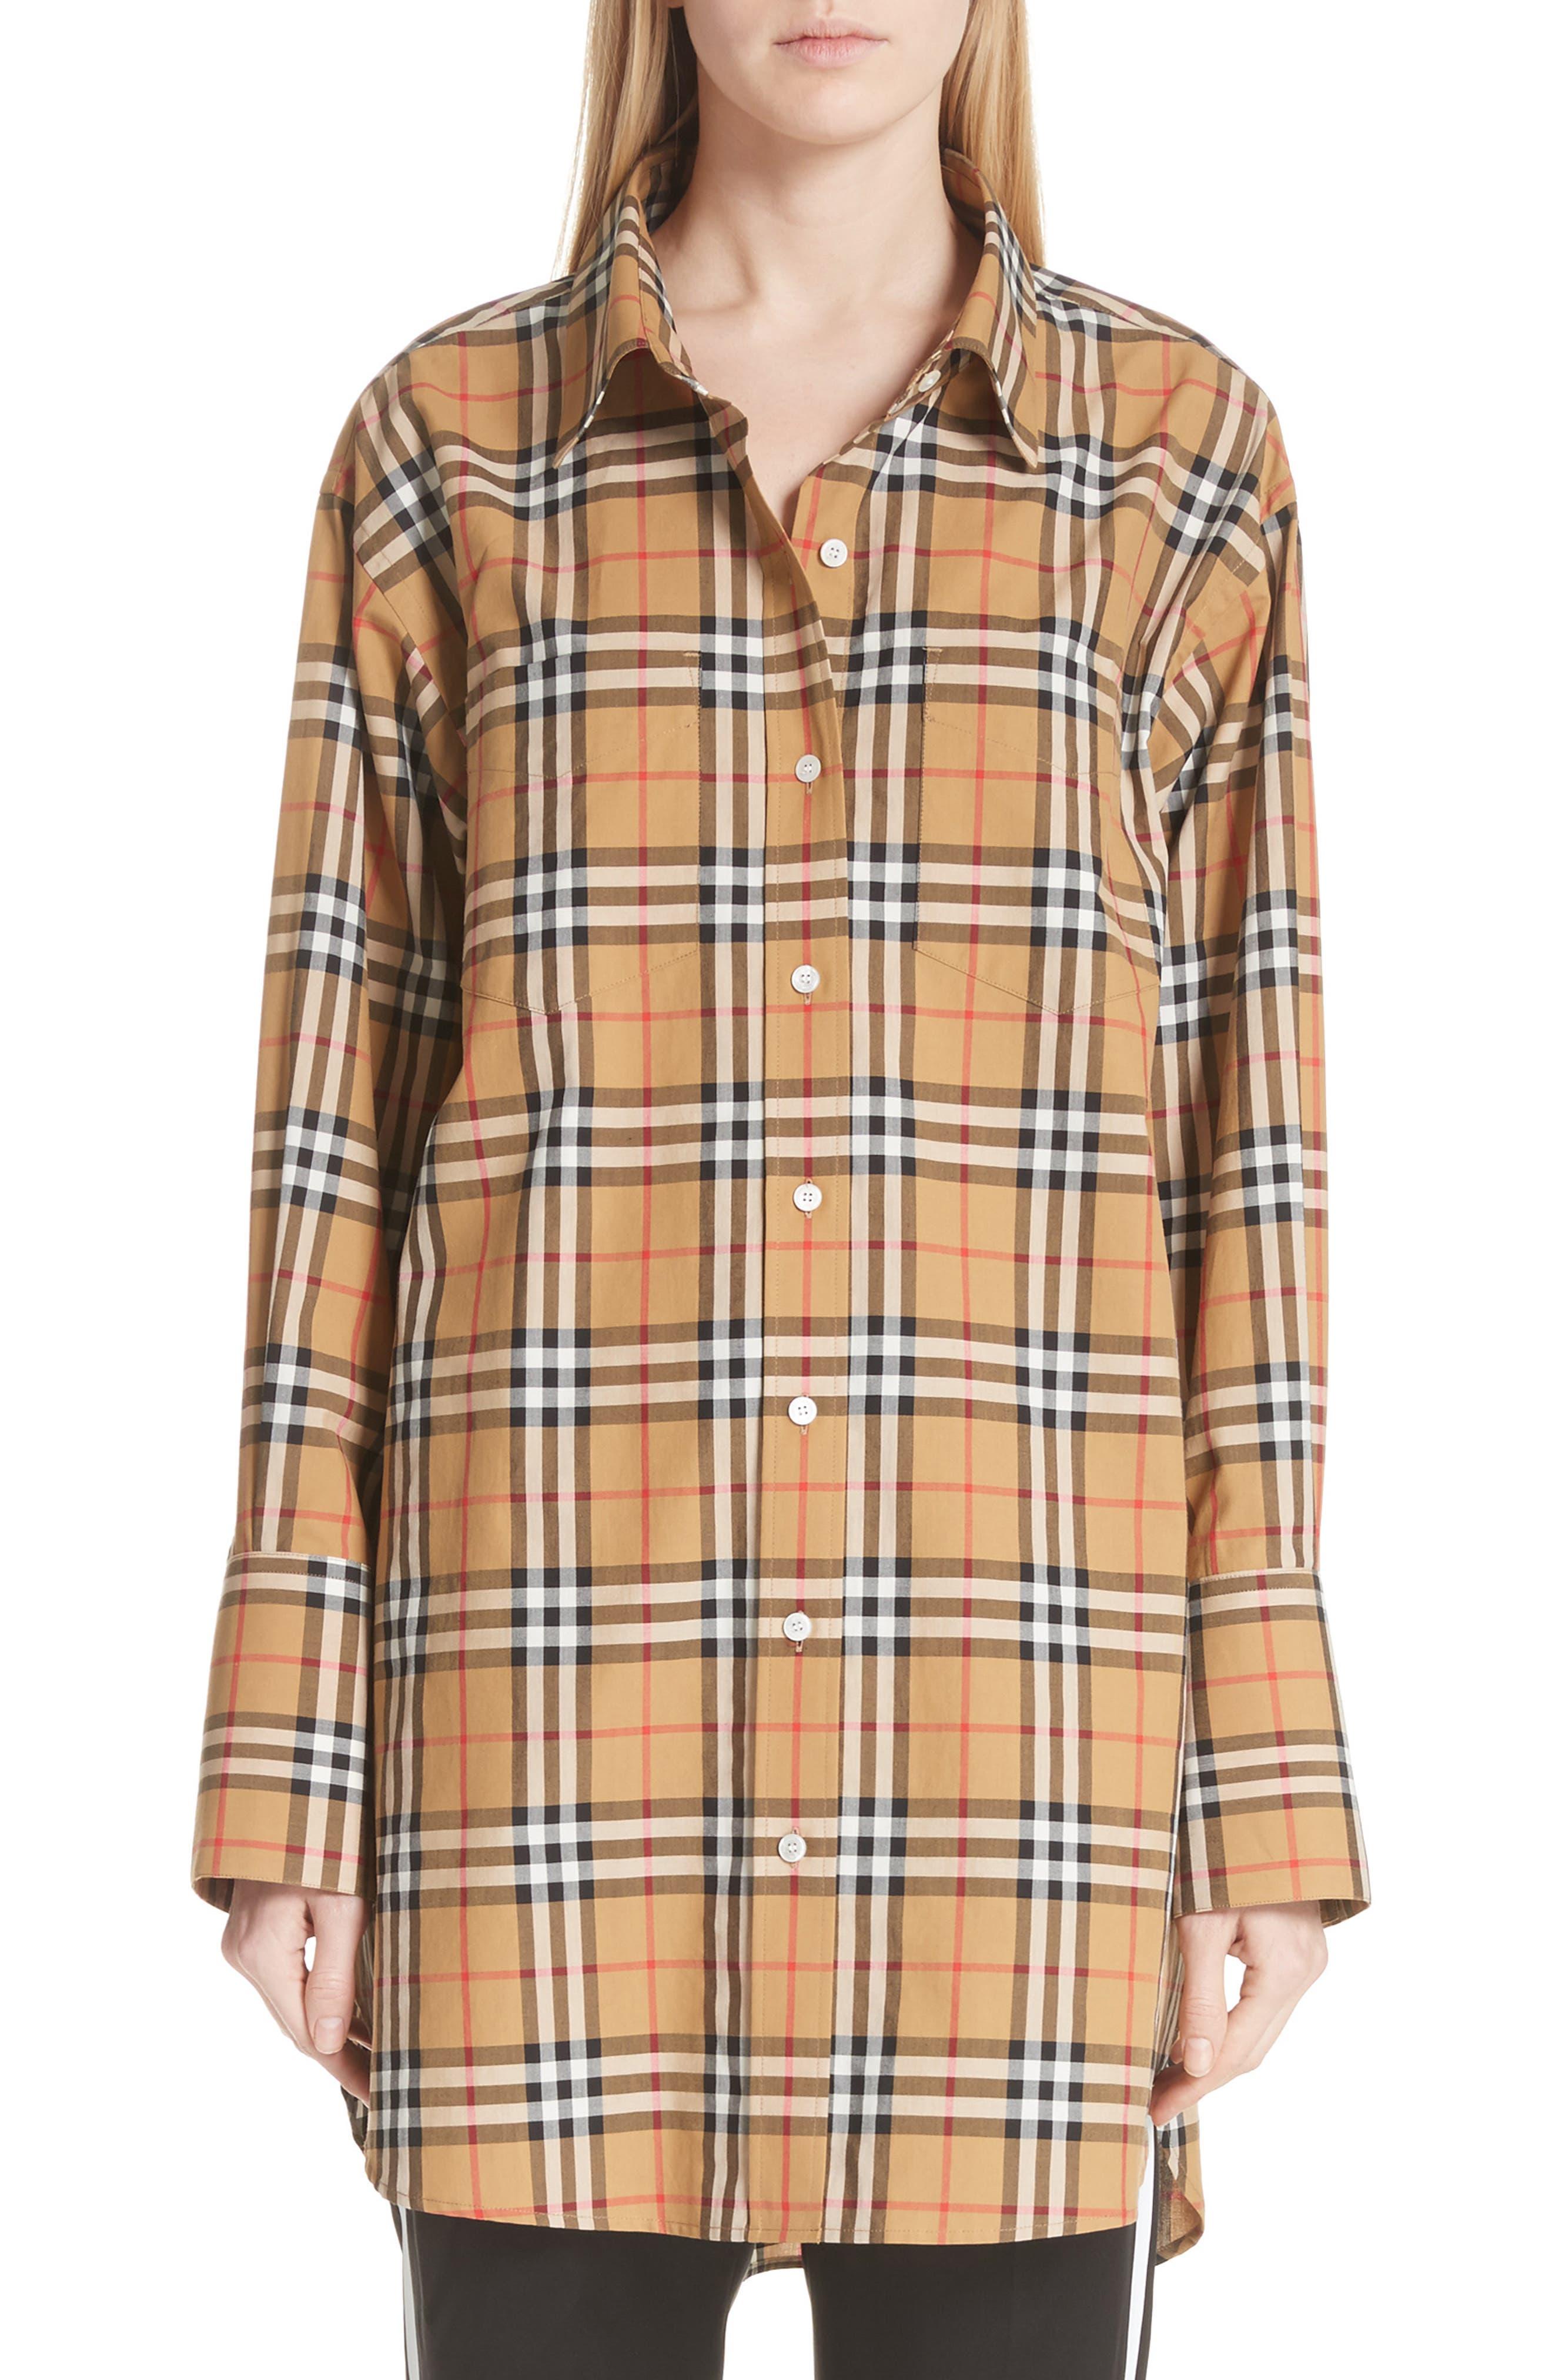 Burberry Redwing Vintage Check Cotton Shirt